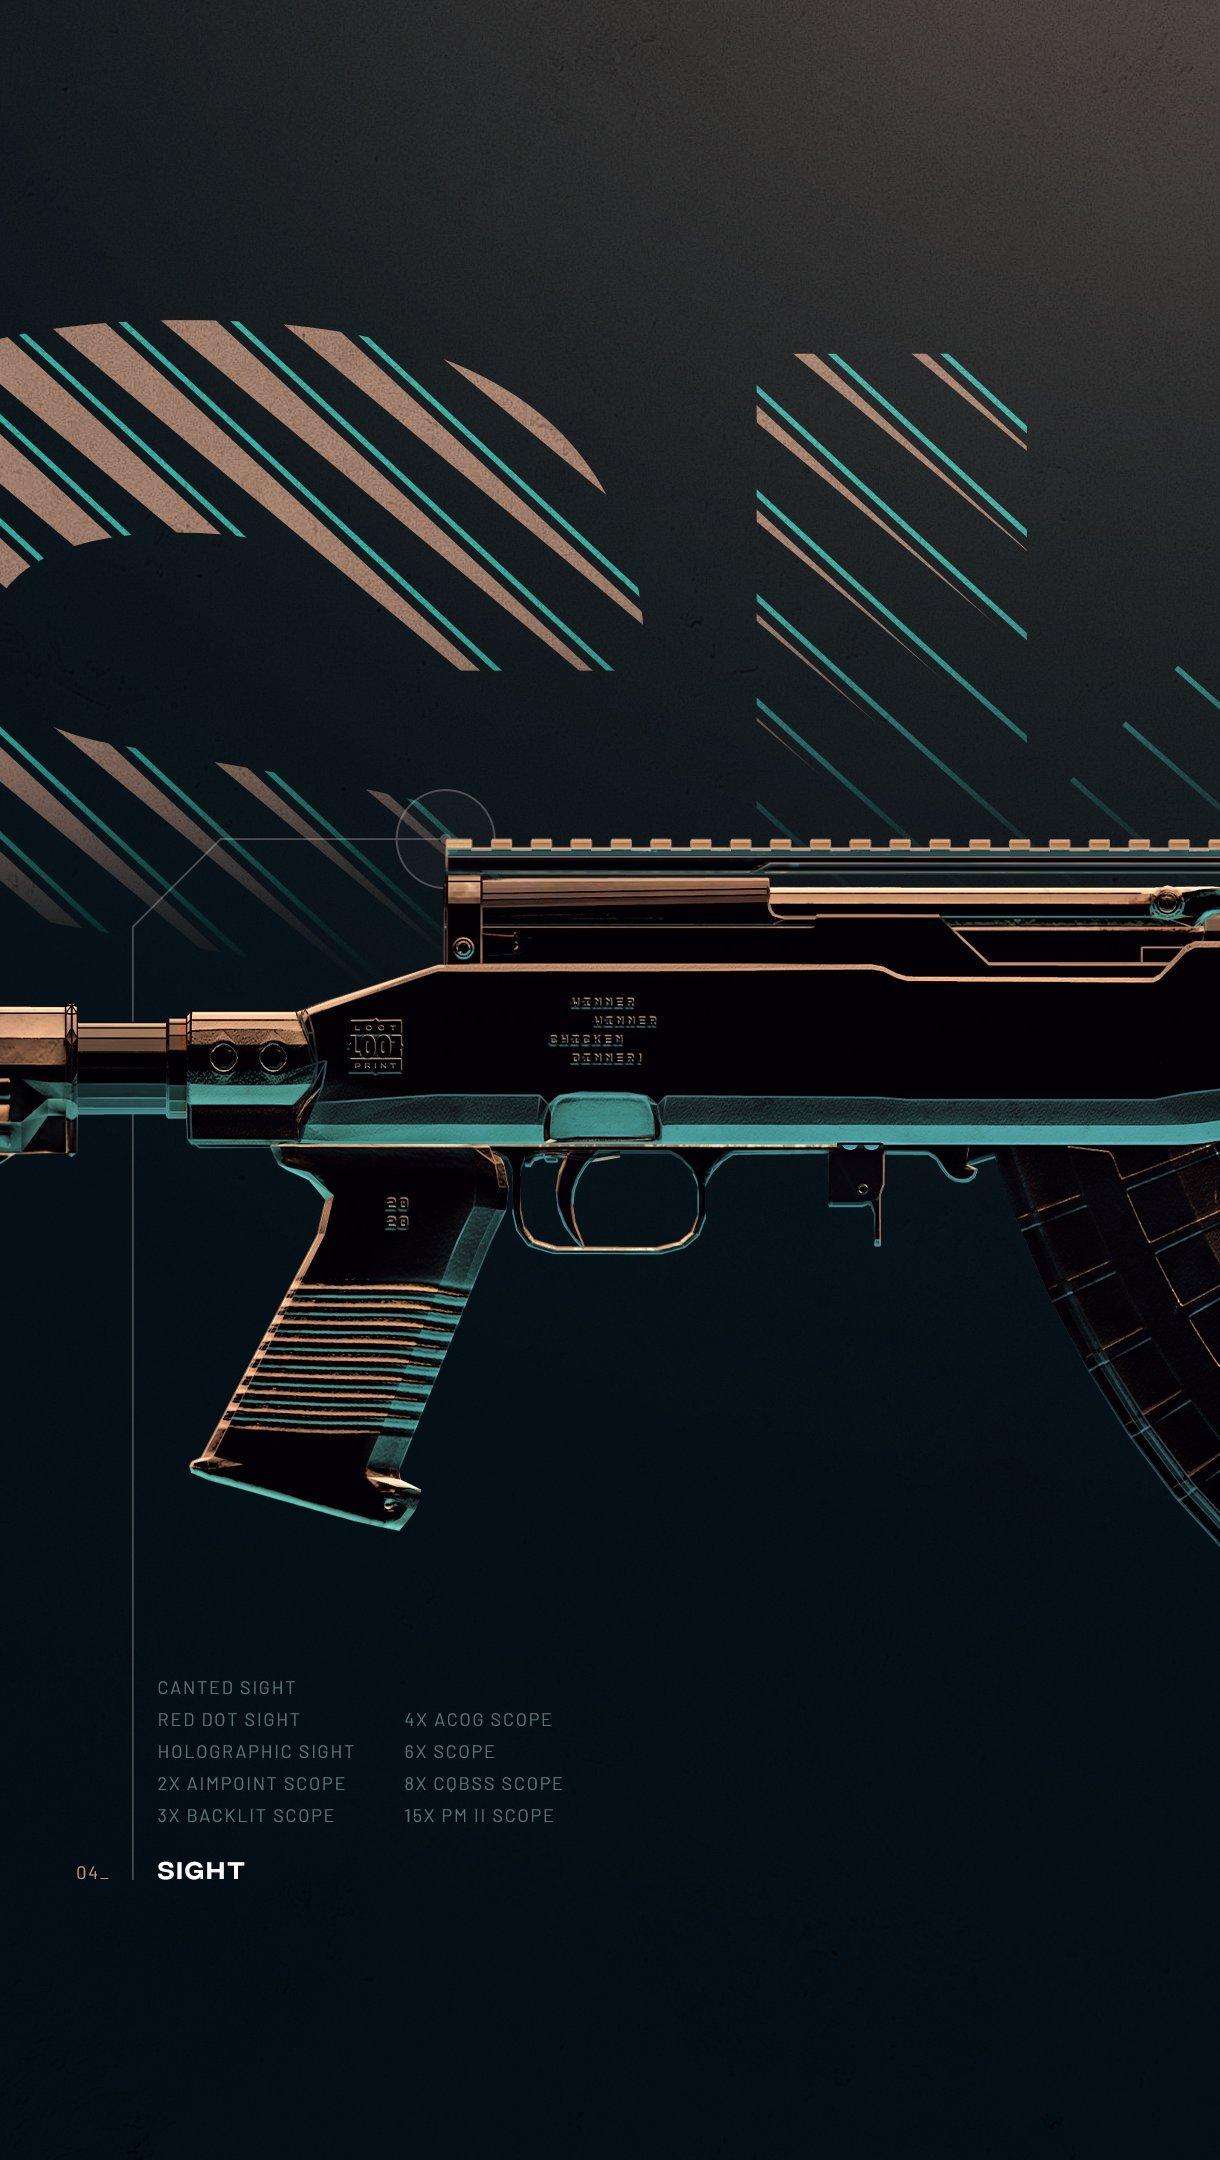 Fondos de pantalla Arma SKS de PUBG Vertical